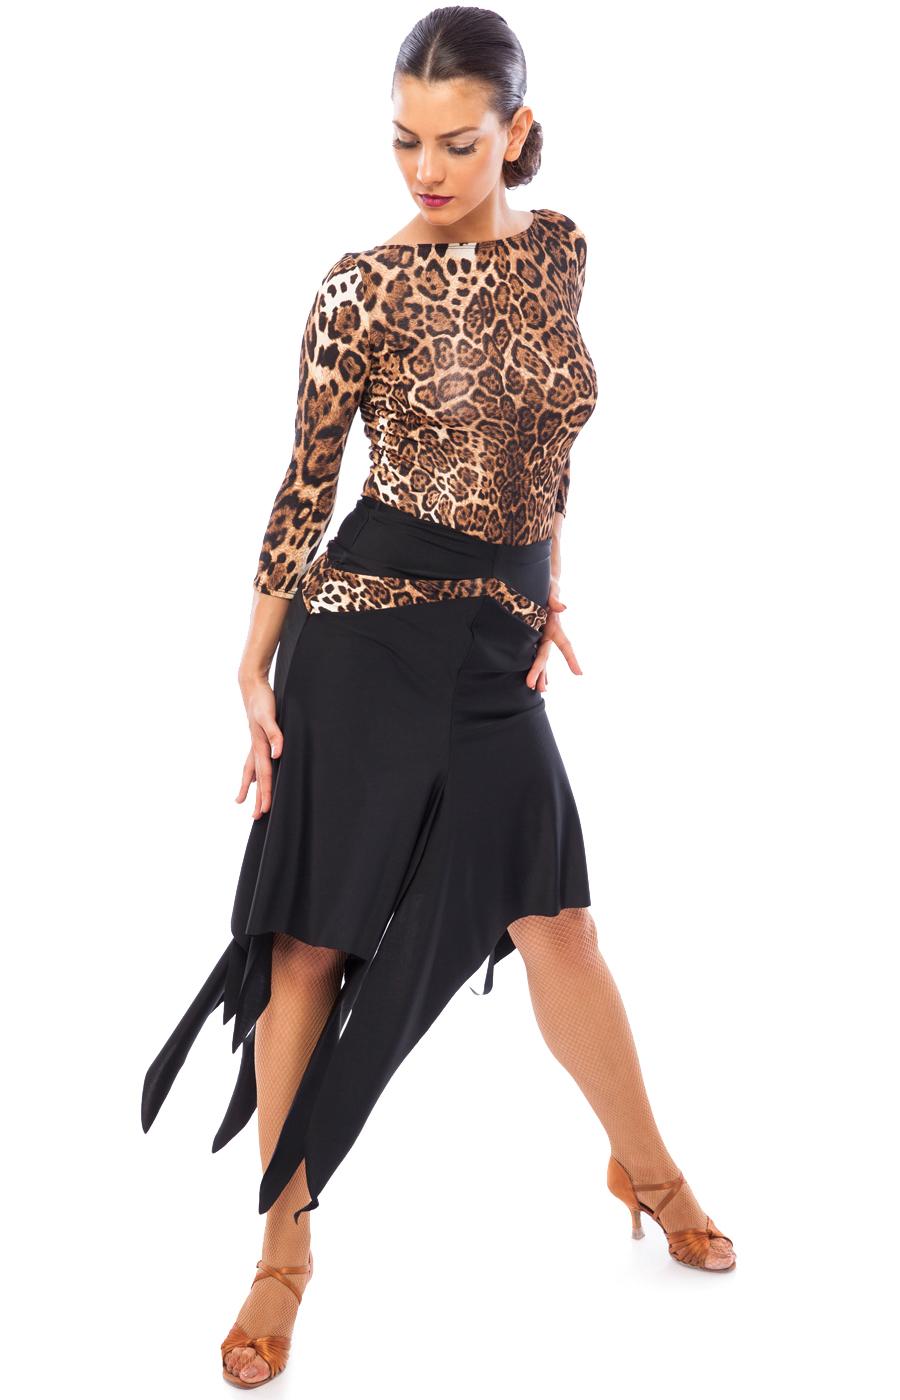 8872c7985 Sasuel Latin Practice Skirt – Vanessa – Tower Ballroom Dance